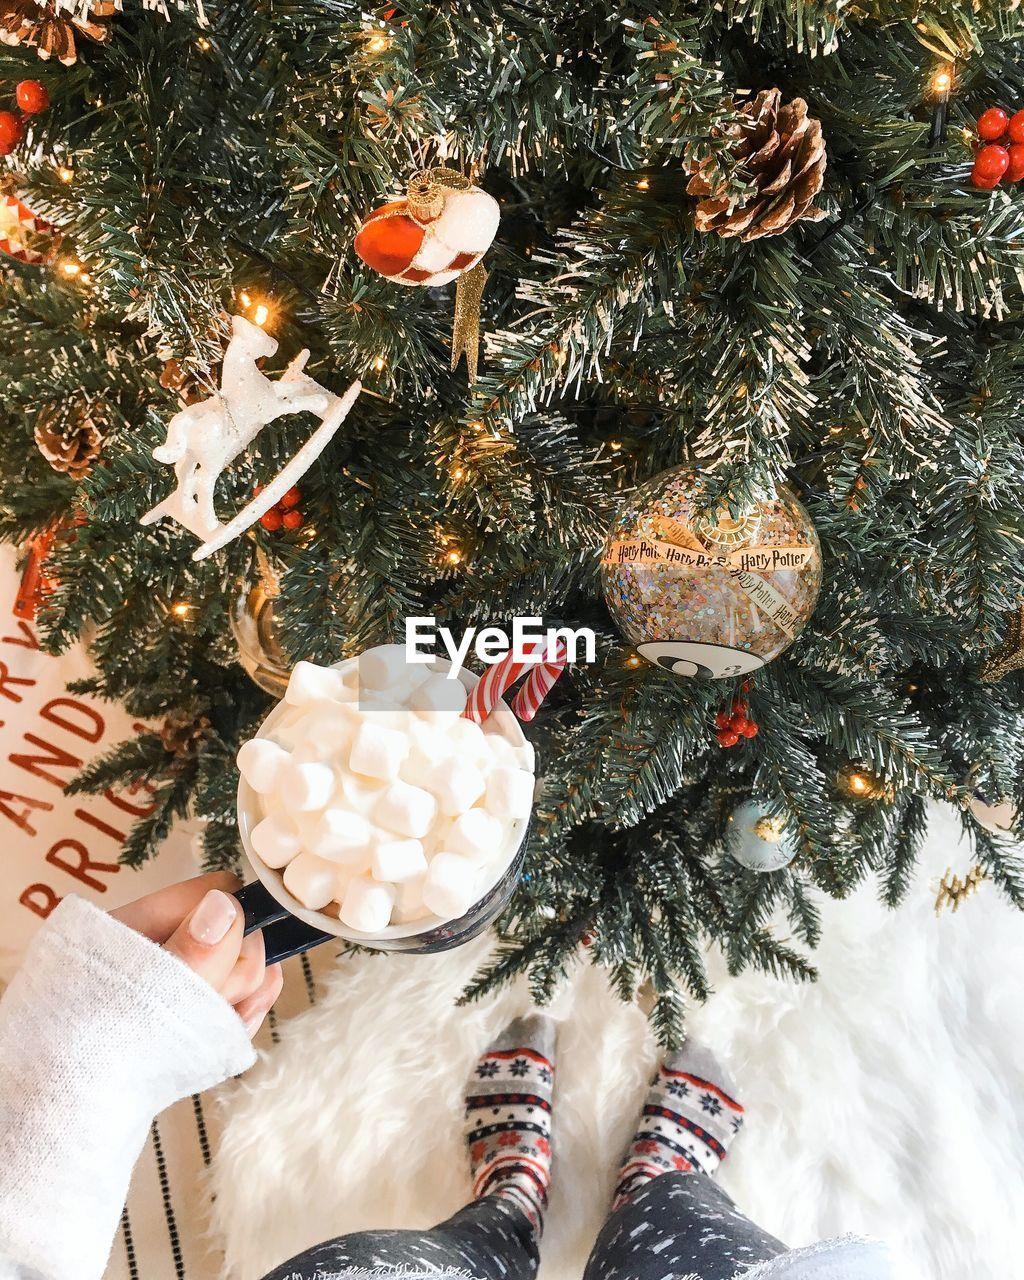 HIGH ANGLE VIEW OF CHRISTMAS DECORATION ON TREE